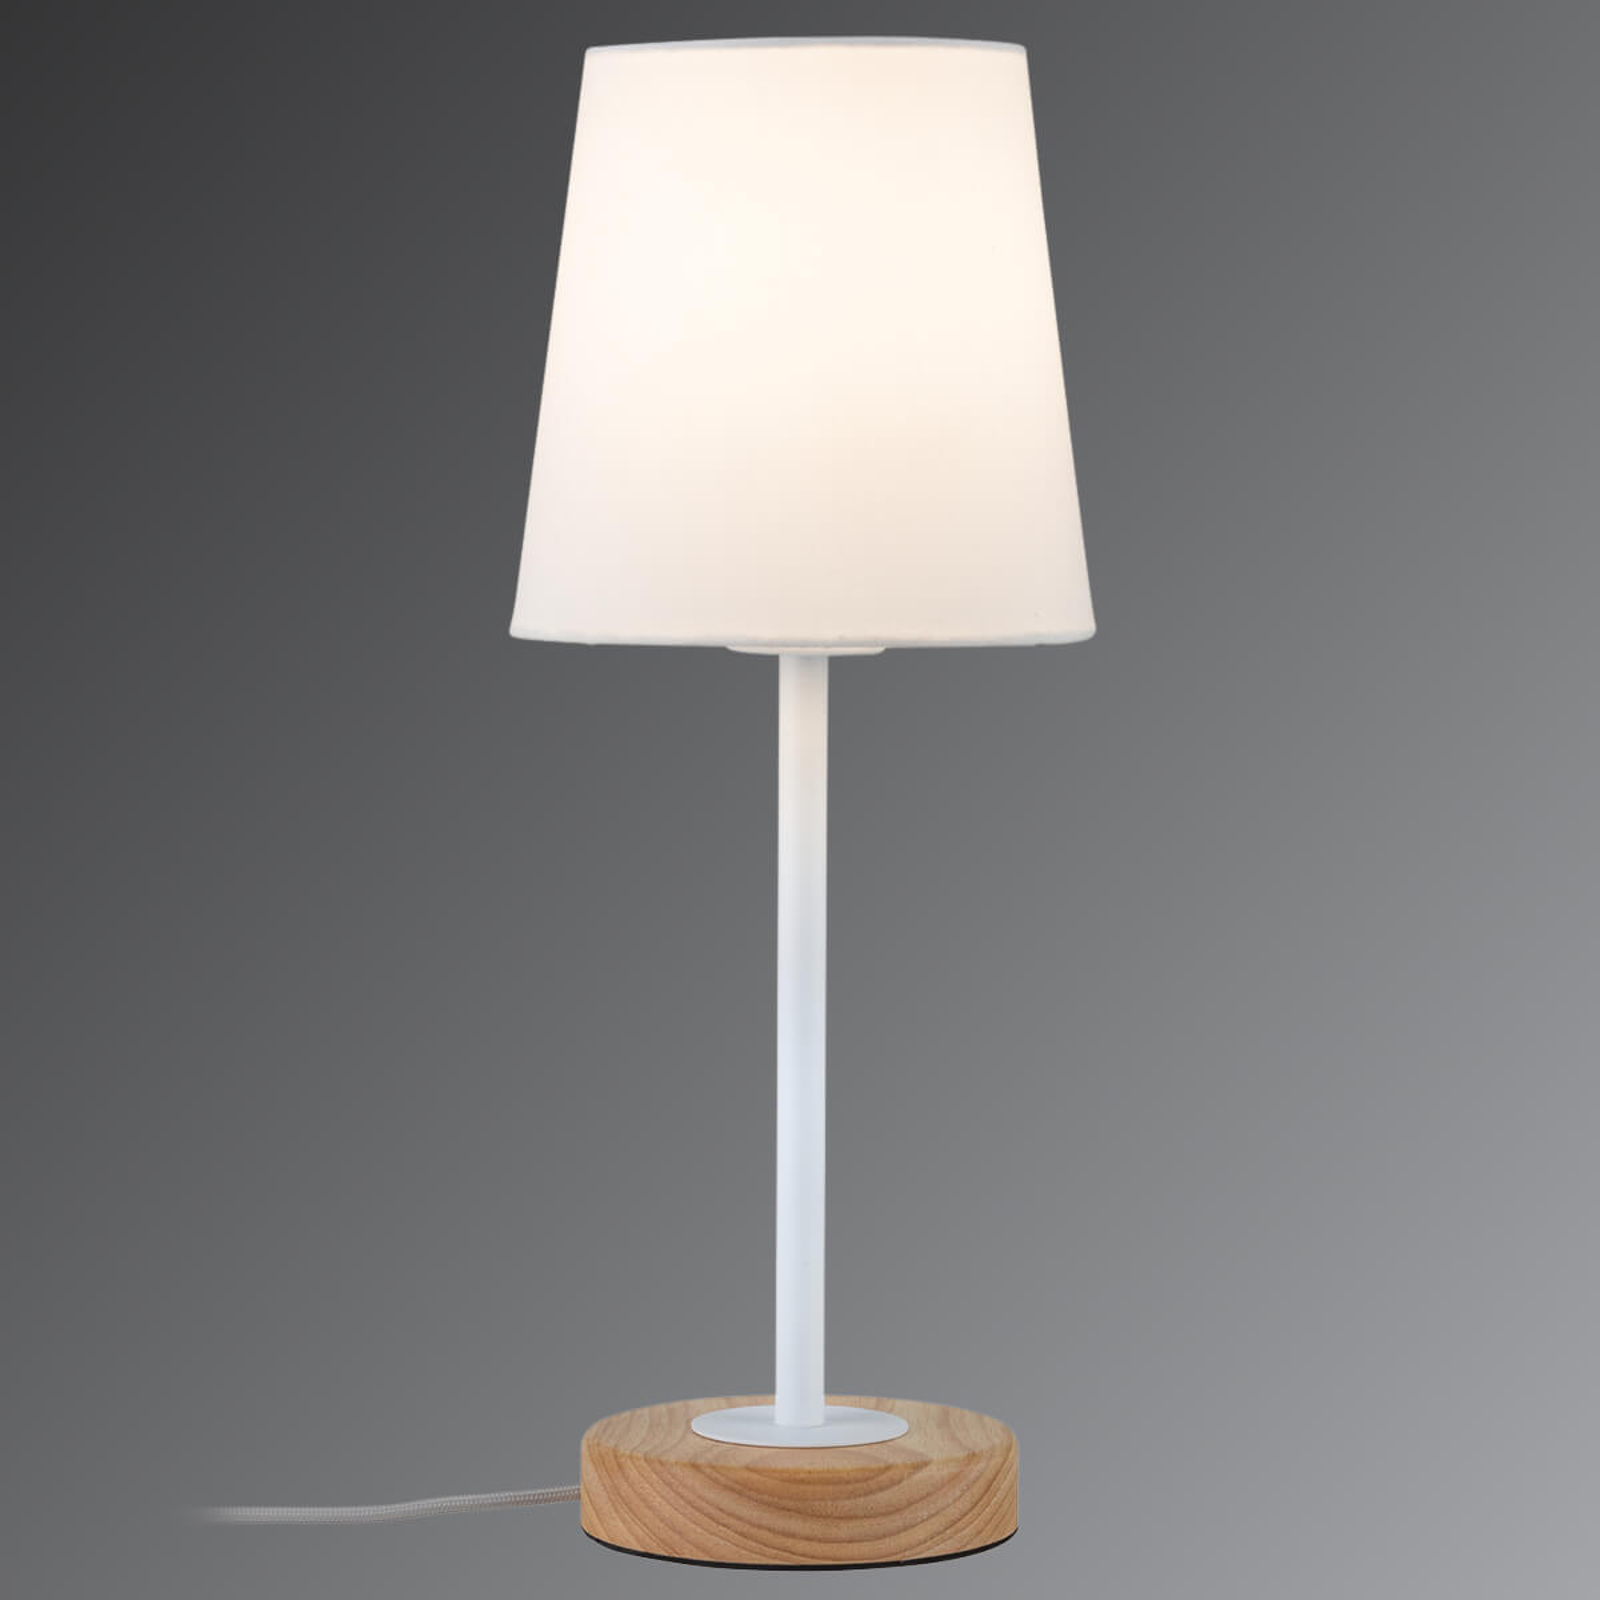 Naturalnie zaprojektowana lampa stołowa Stellan